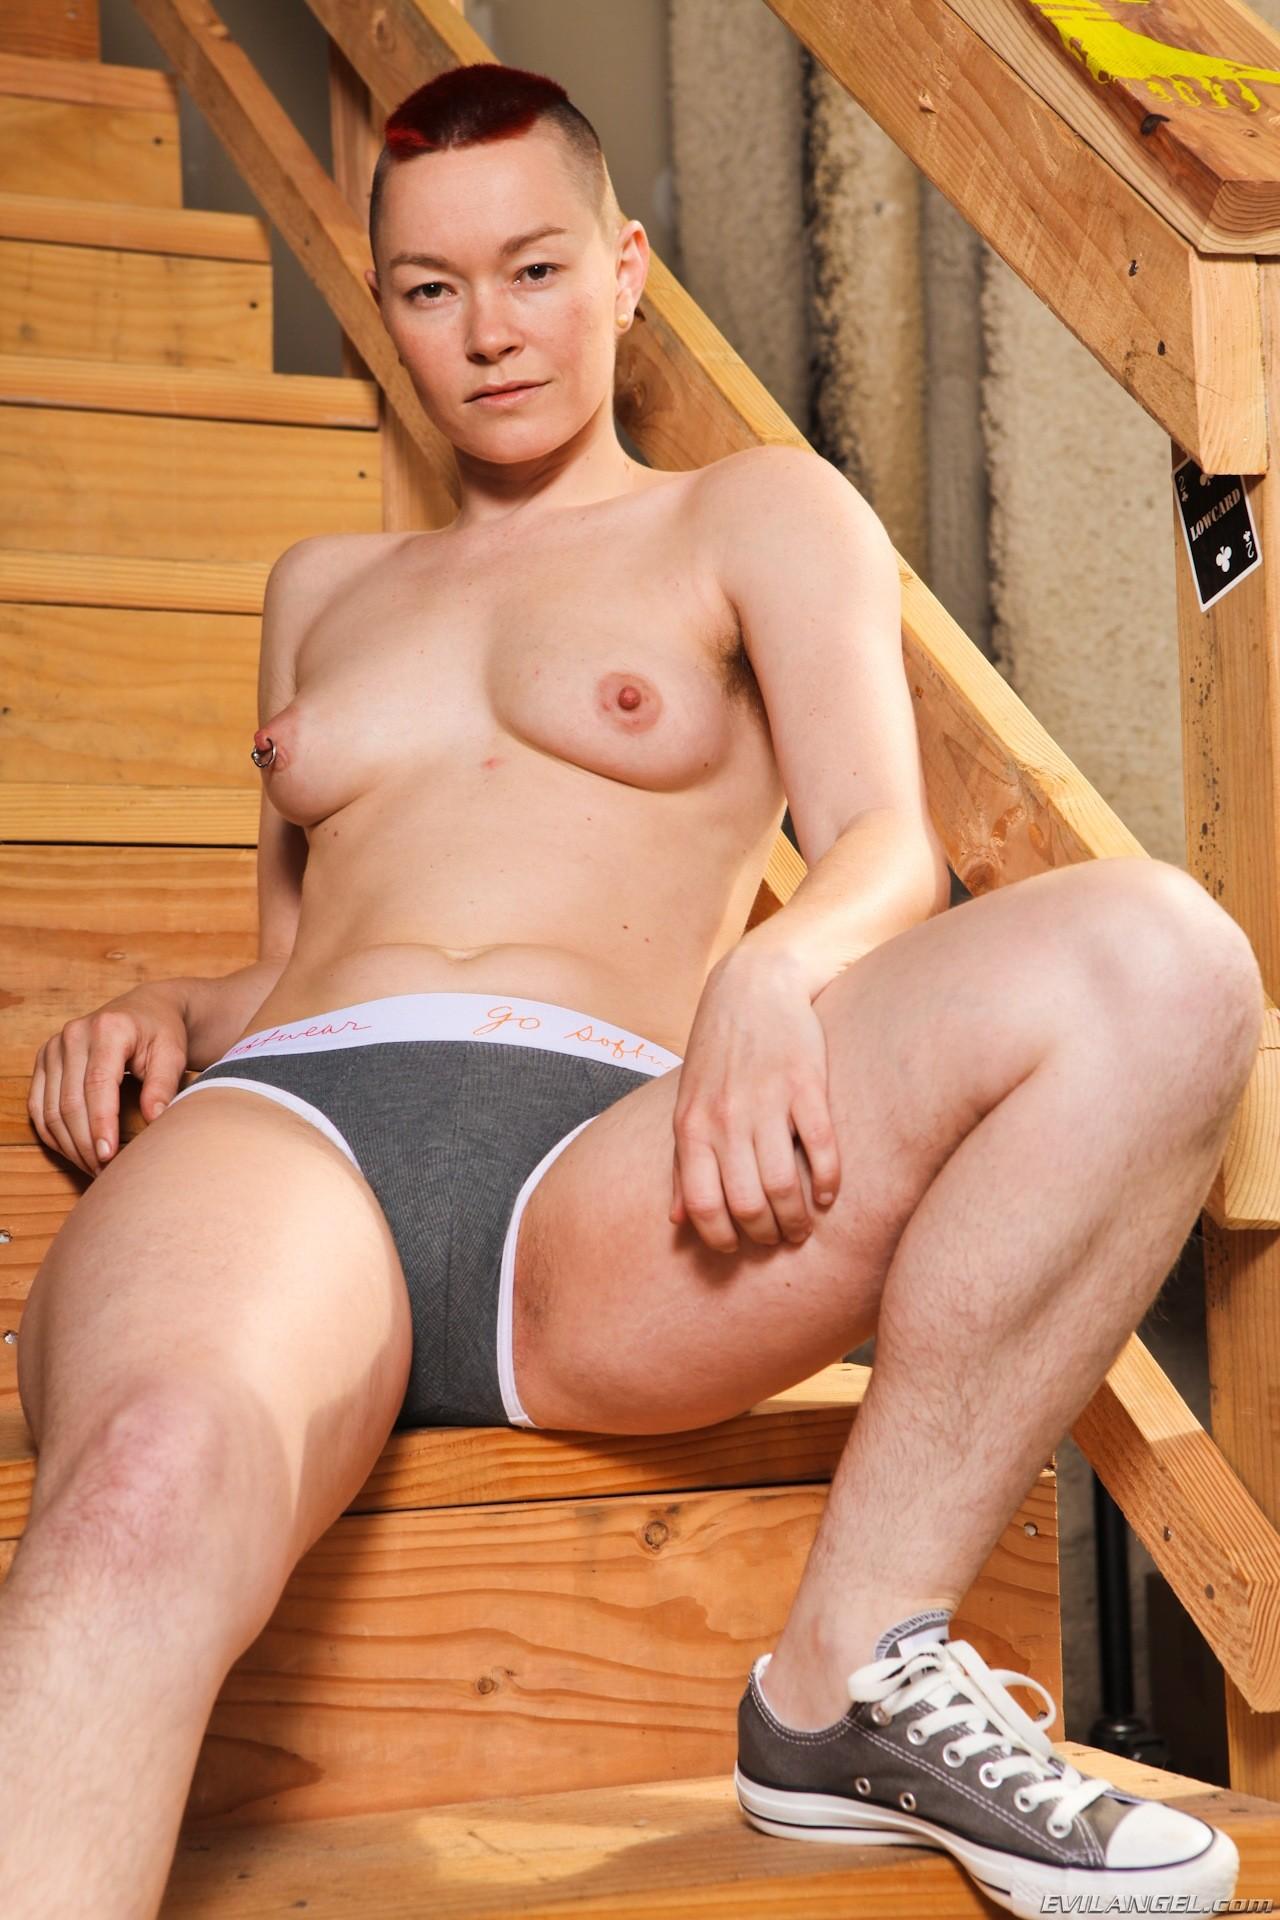 Bobbi Starr - Vicarious 73234-6372